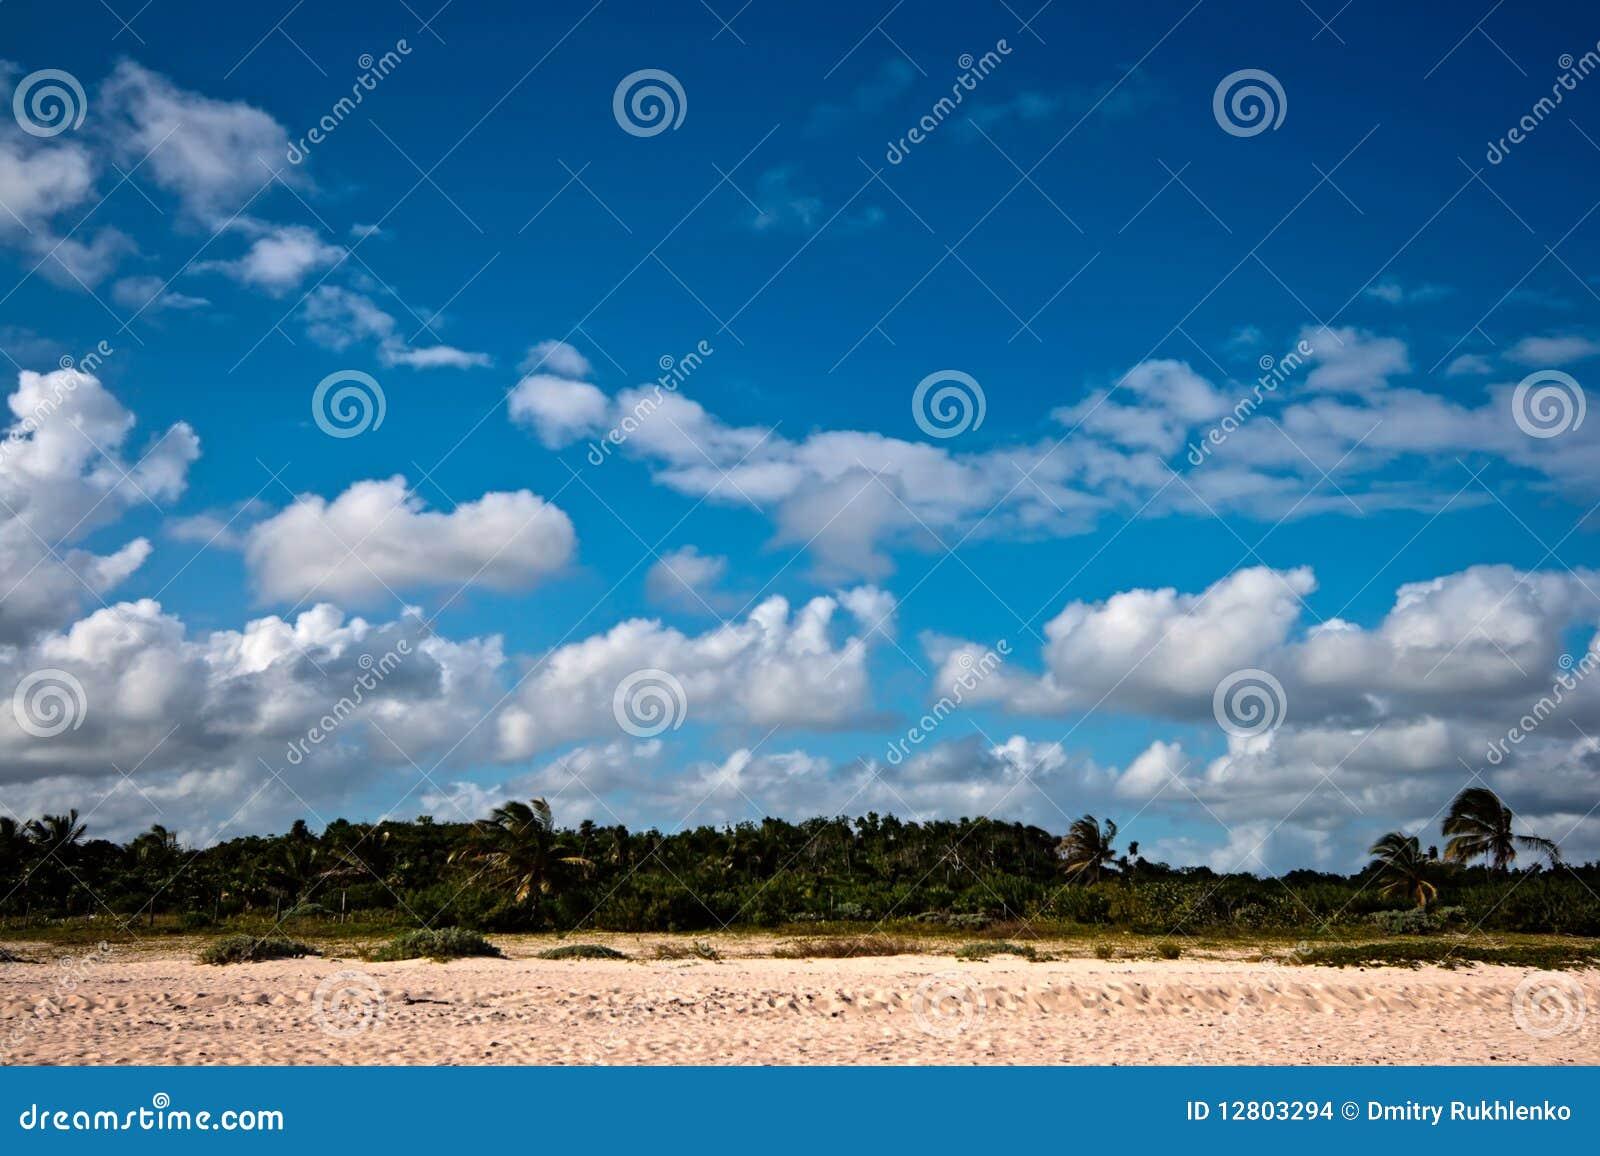 Praia e palmas bonitas